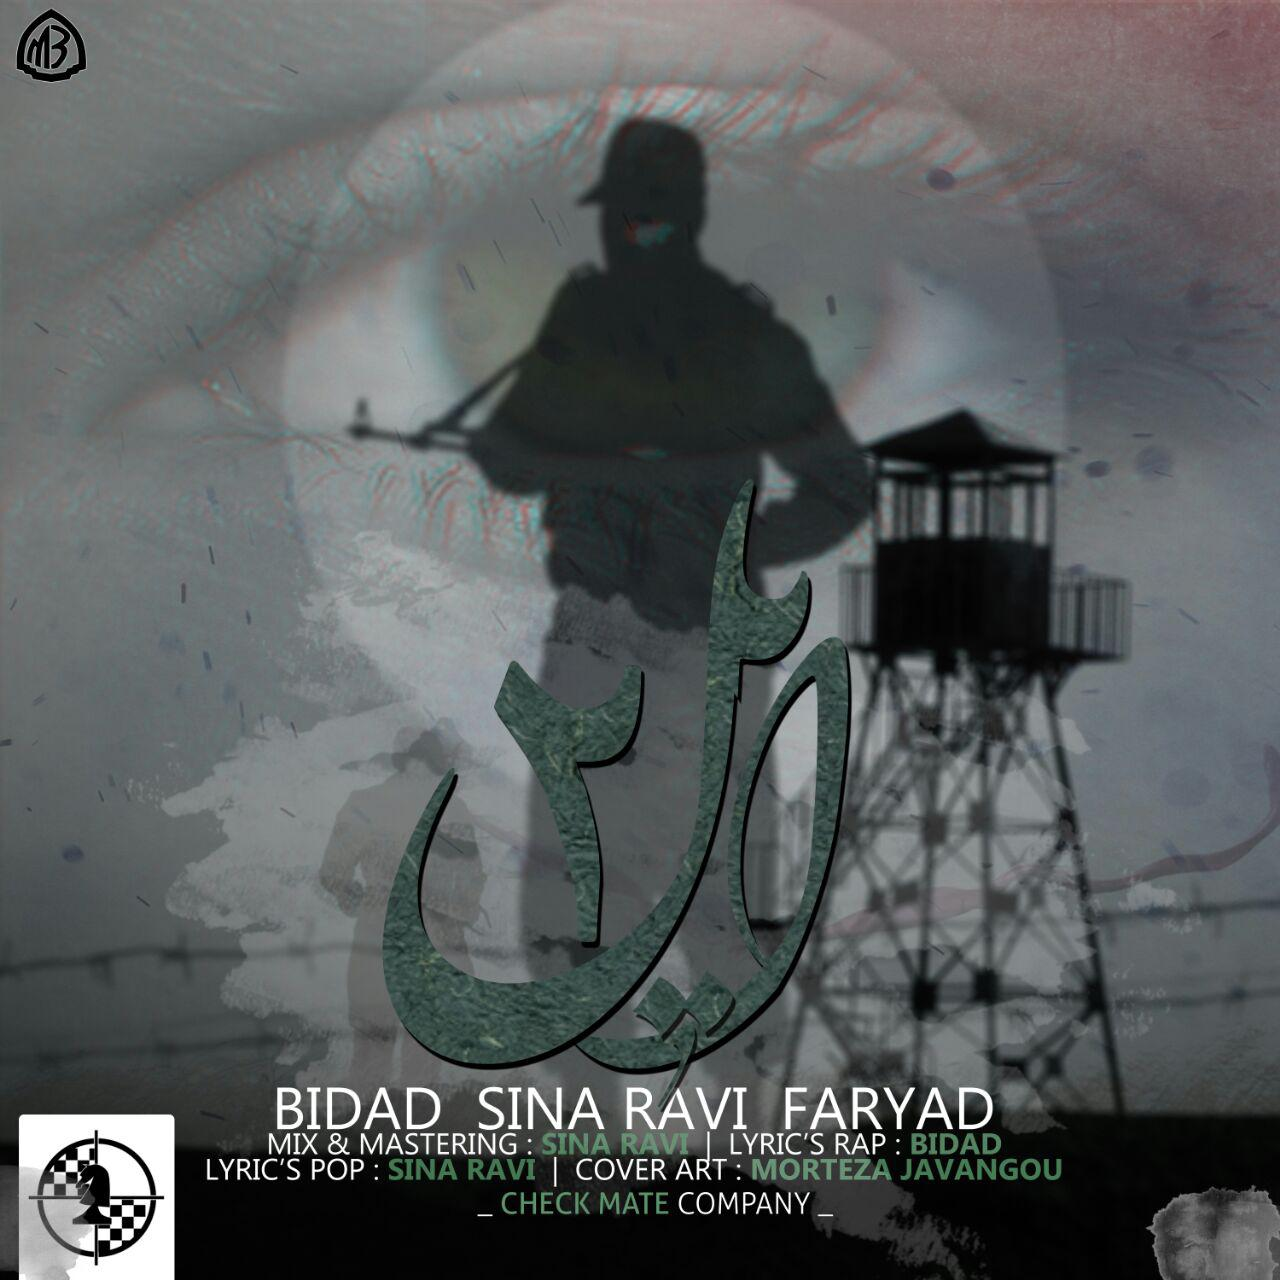 http://s9.picofile.com/file/8340118192/04Bidad_Ft_Sina_Ravi_Ft_Faryad_2_iL.jpg